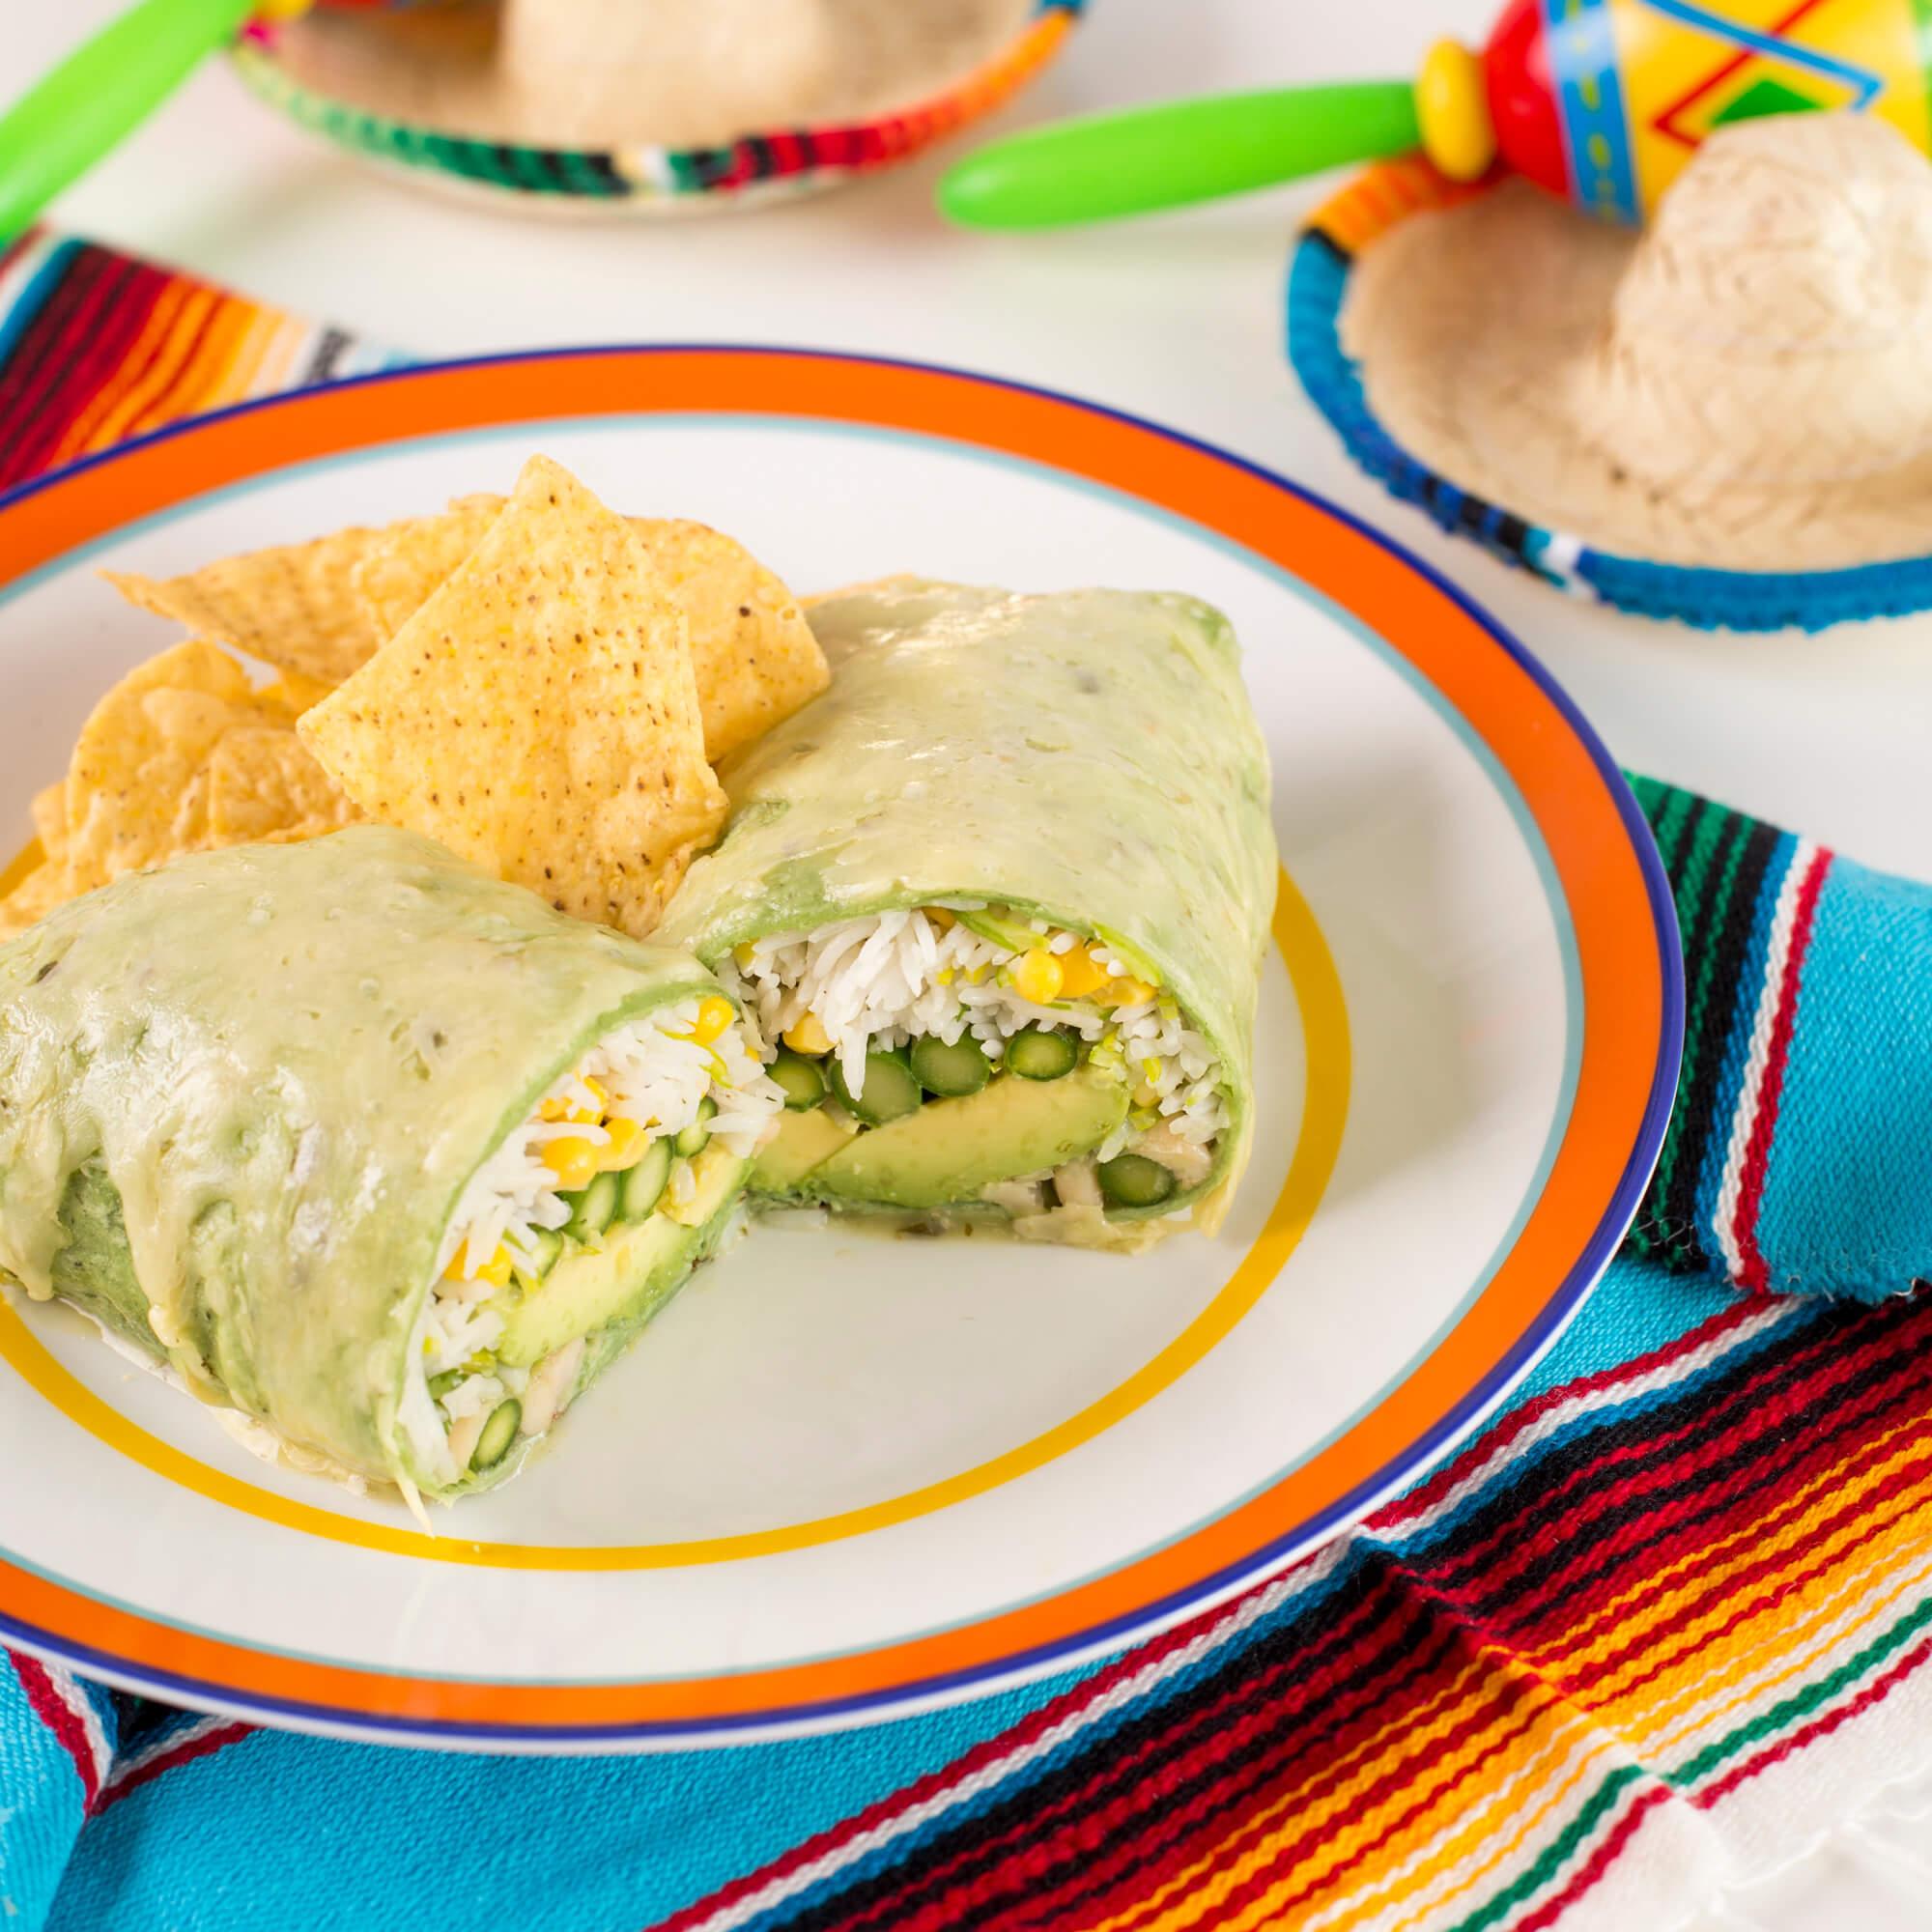 Green Royal Basmati Rice Burrito Enchilada Style